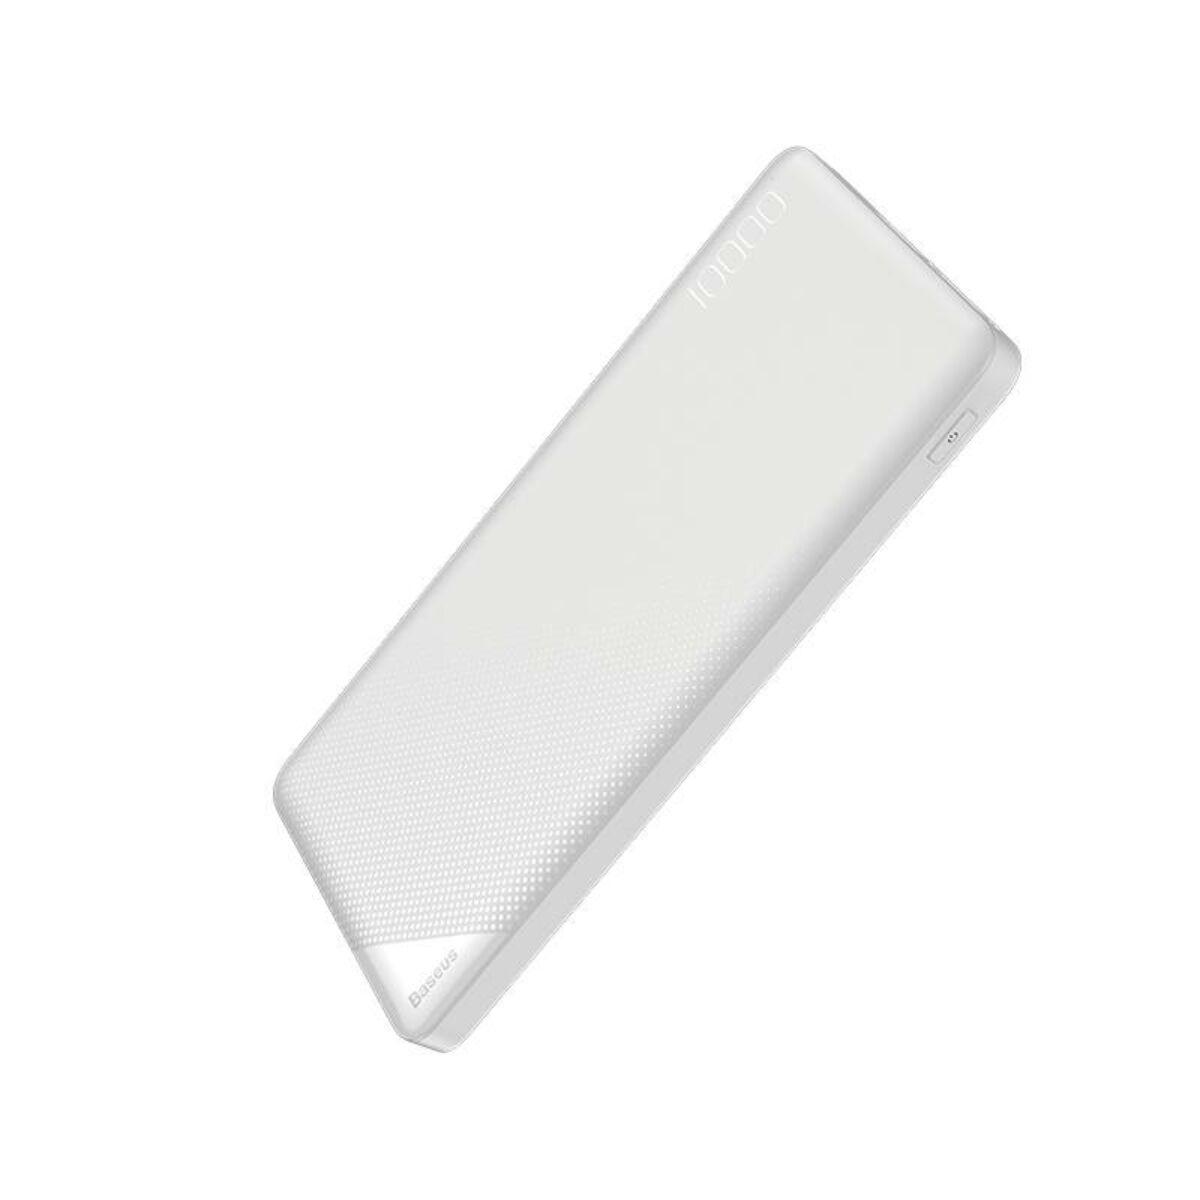 Baseus Power Bank Mini Cu, (Micro USB bemenet / dupla USB kimenet), 2.1A, 10.000 mAh, fehér (PPALL-KU02)